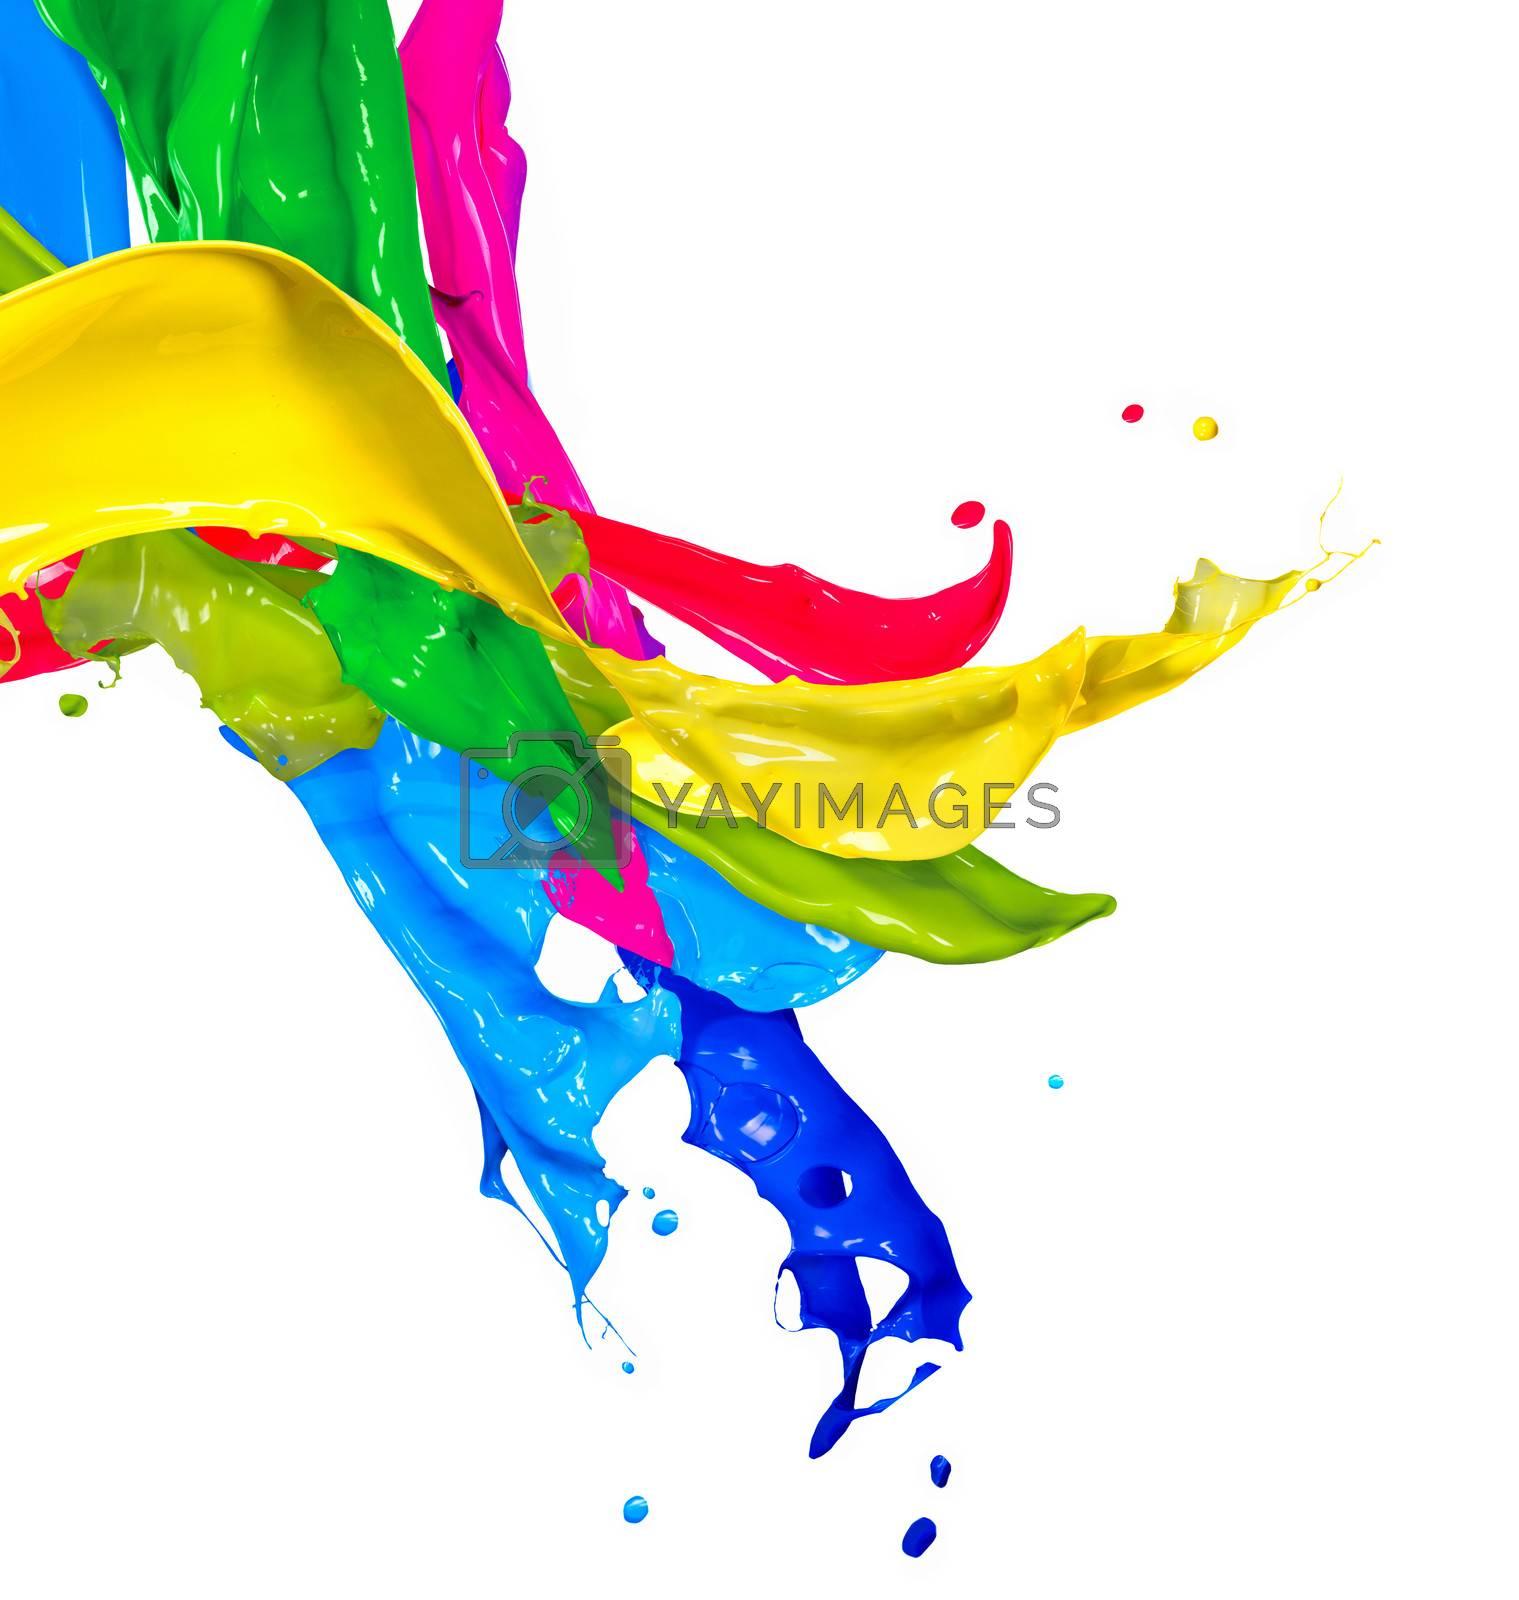 Colorful Paint Splash Isolated on White. Abstract Splashing